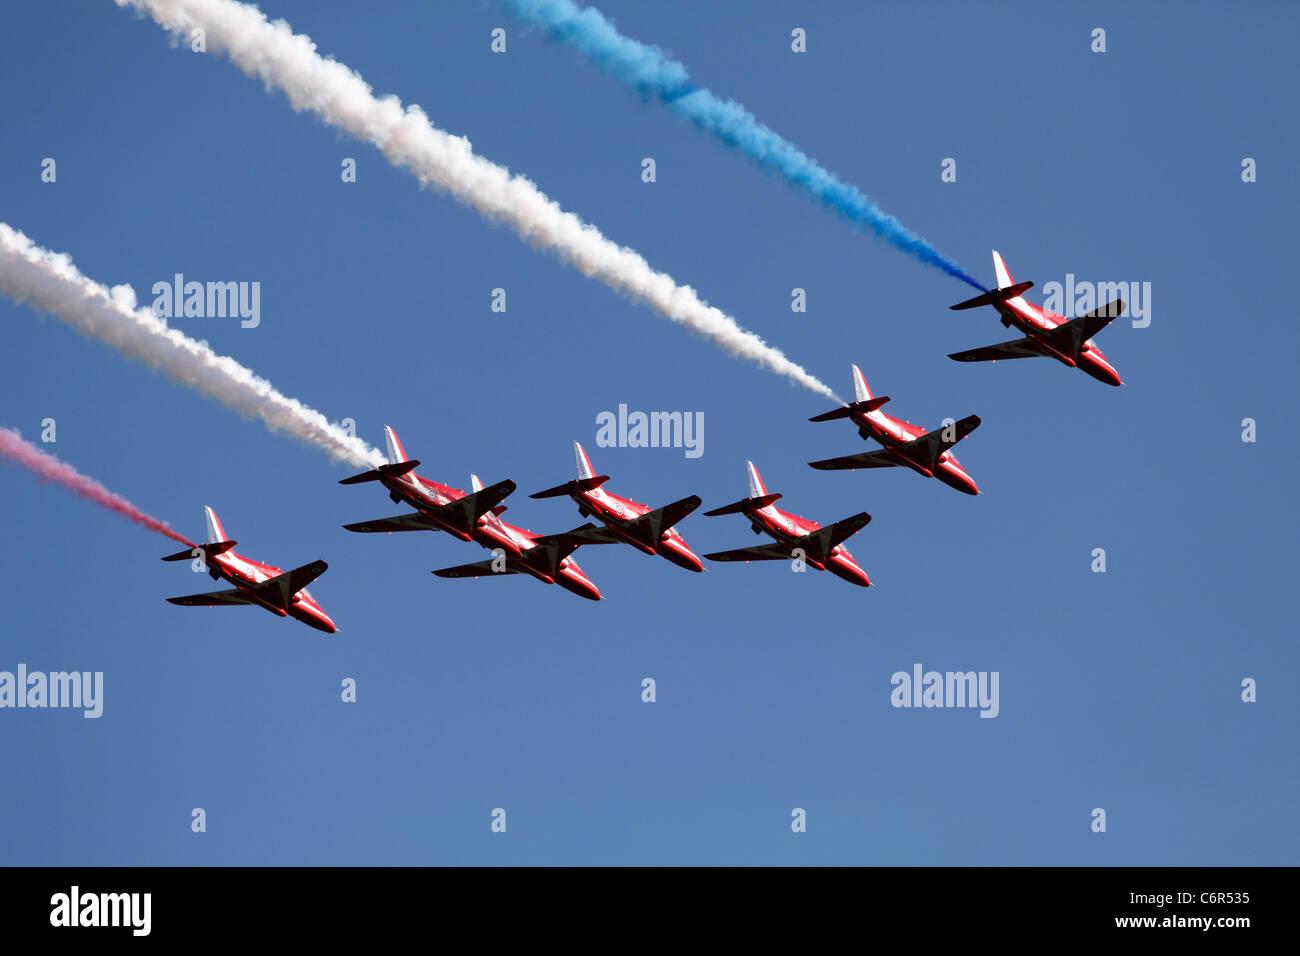 Raf Jet Stock Photos & Raf Jet Stock Images - Alamy